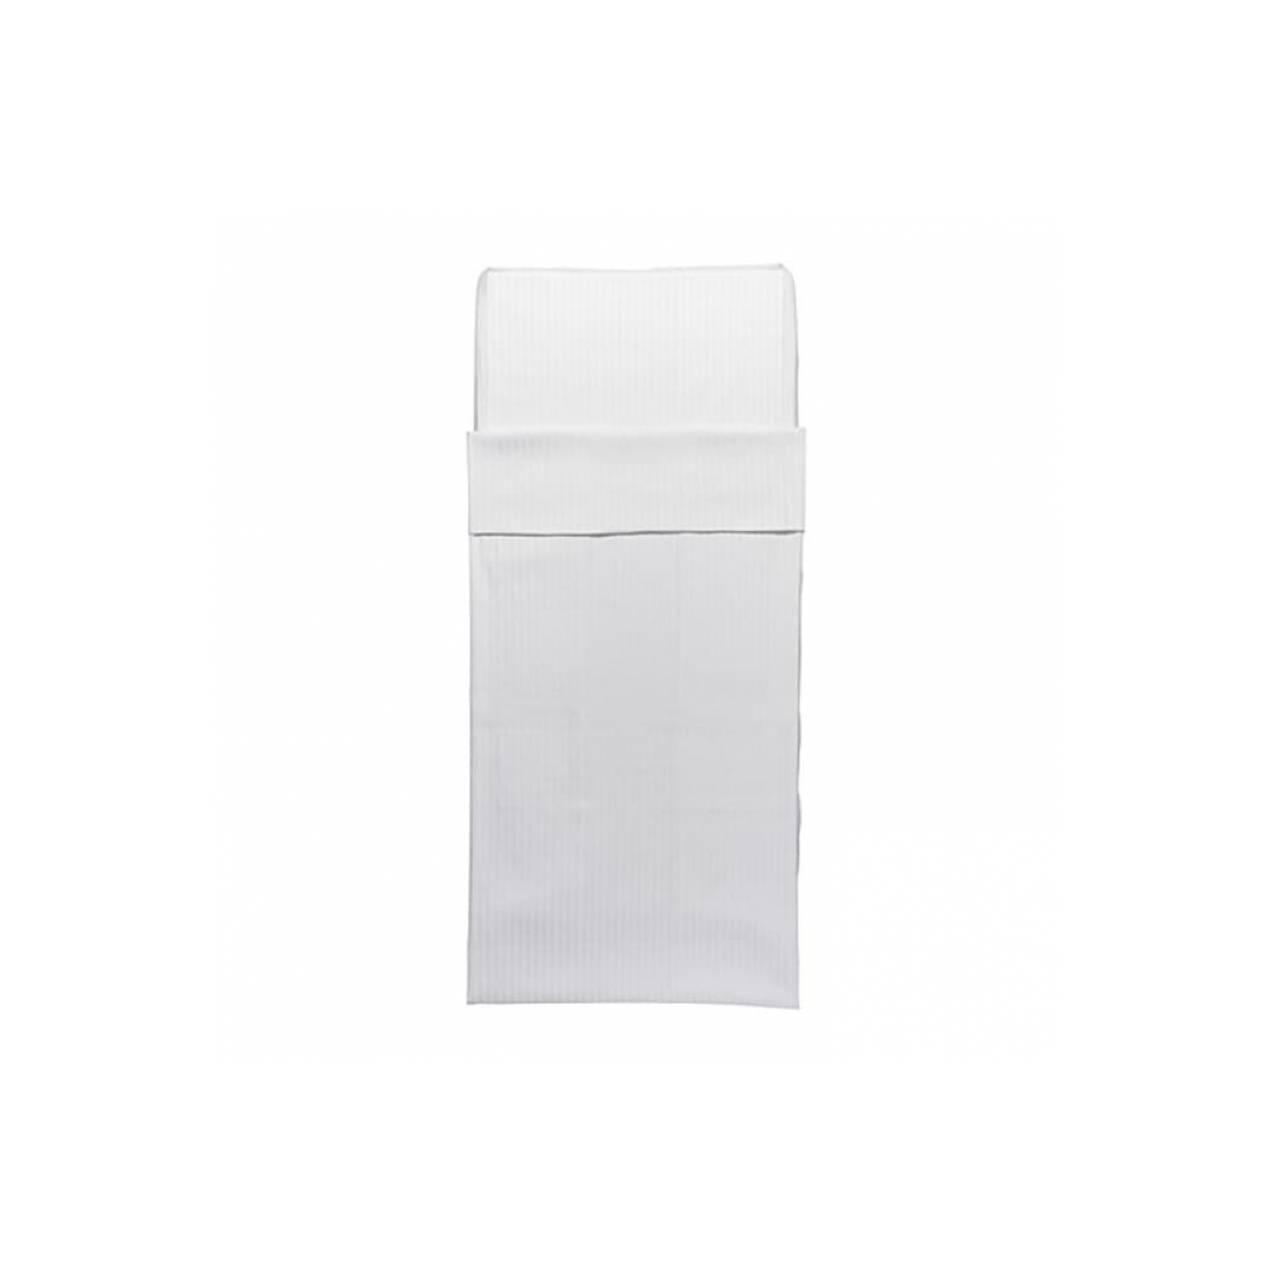 TERBARU IKEA LEKLYSTEN, Sarung Quilt/ Bantal untuk Ranjang Bayi,